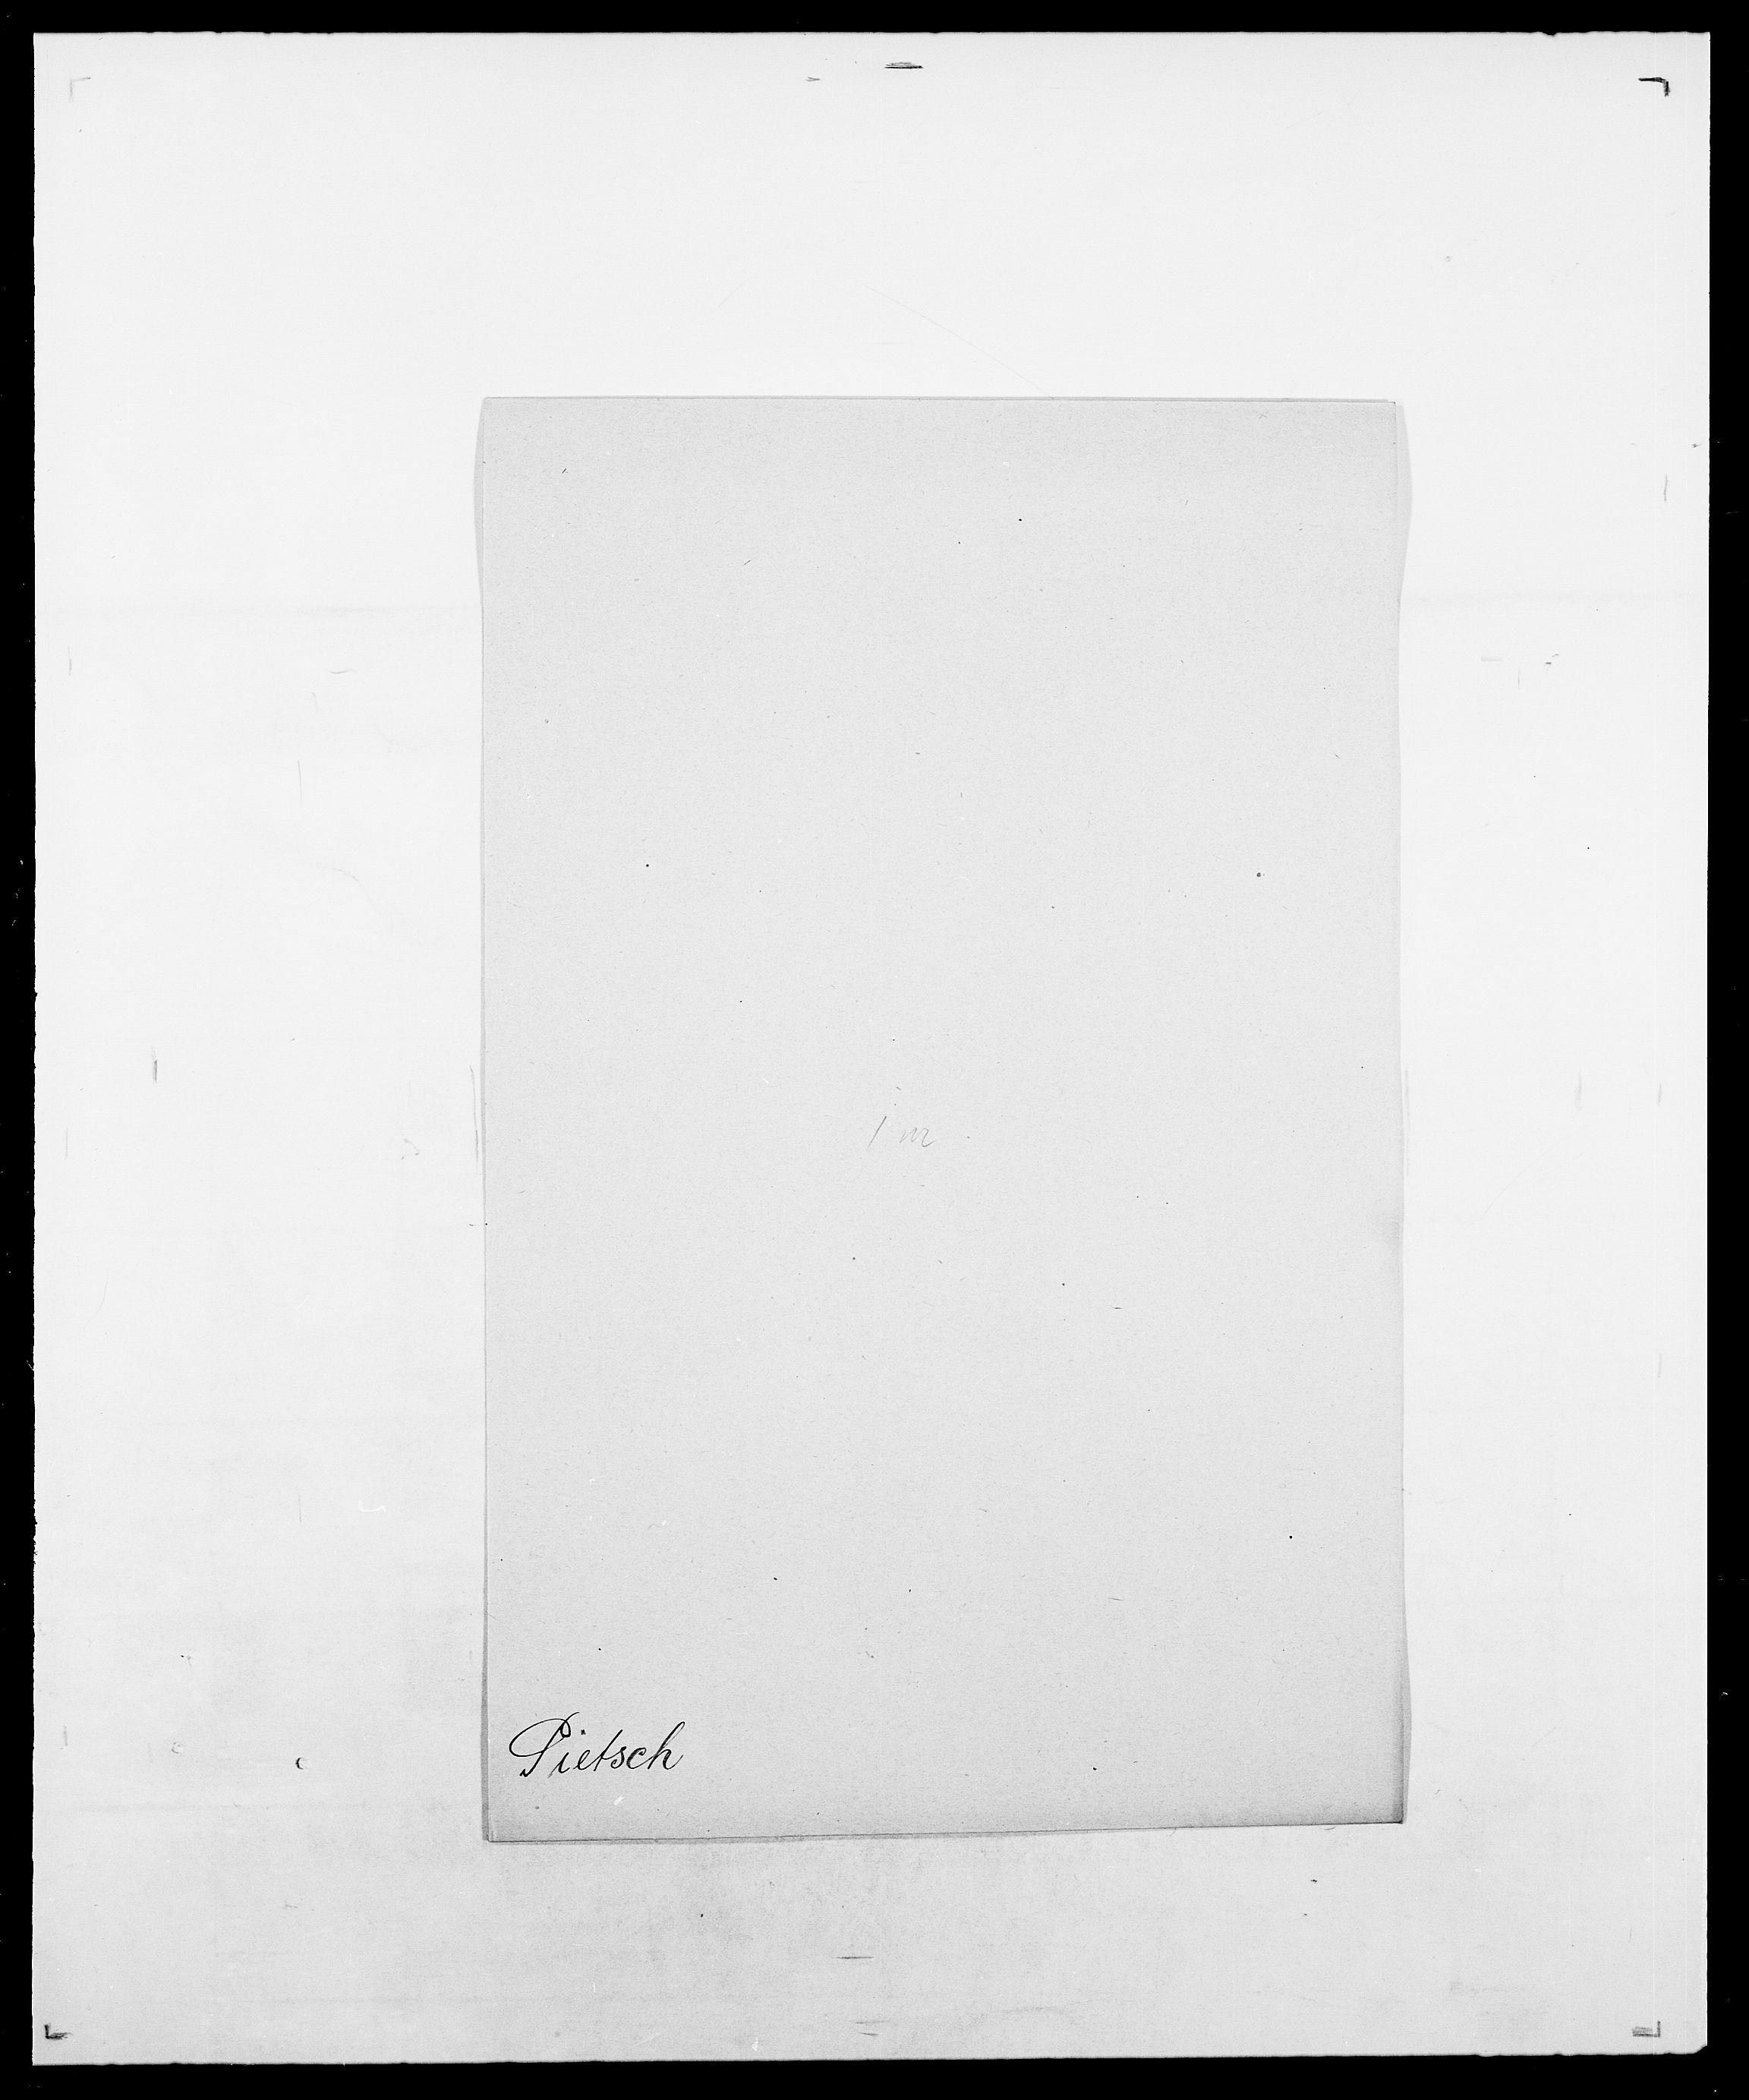 SAO, Delgobe, Charles Antoine - samling, D/Da/L0030: Paars - Pittelkov, s. 528